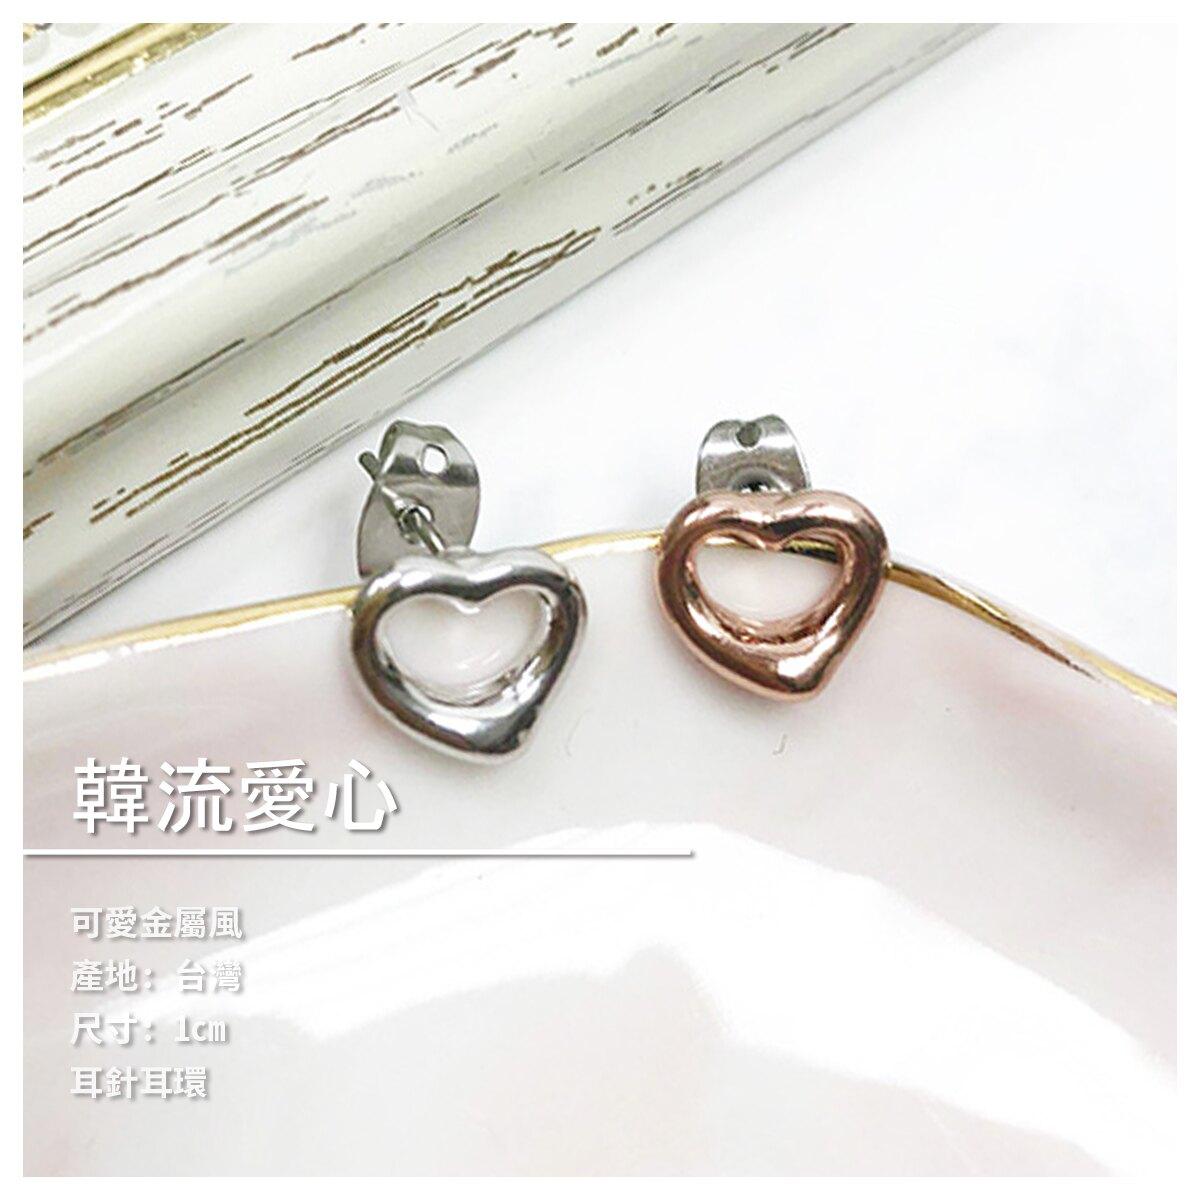 【JG飾品】可愛金屬 風韓流愛心 耳針耳環 2款